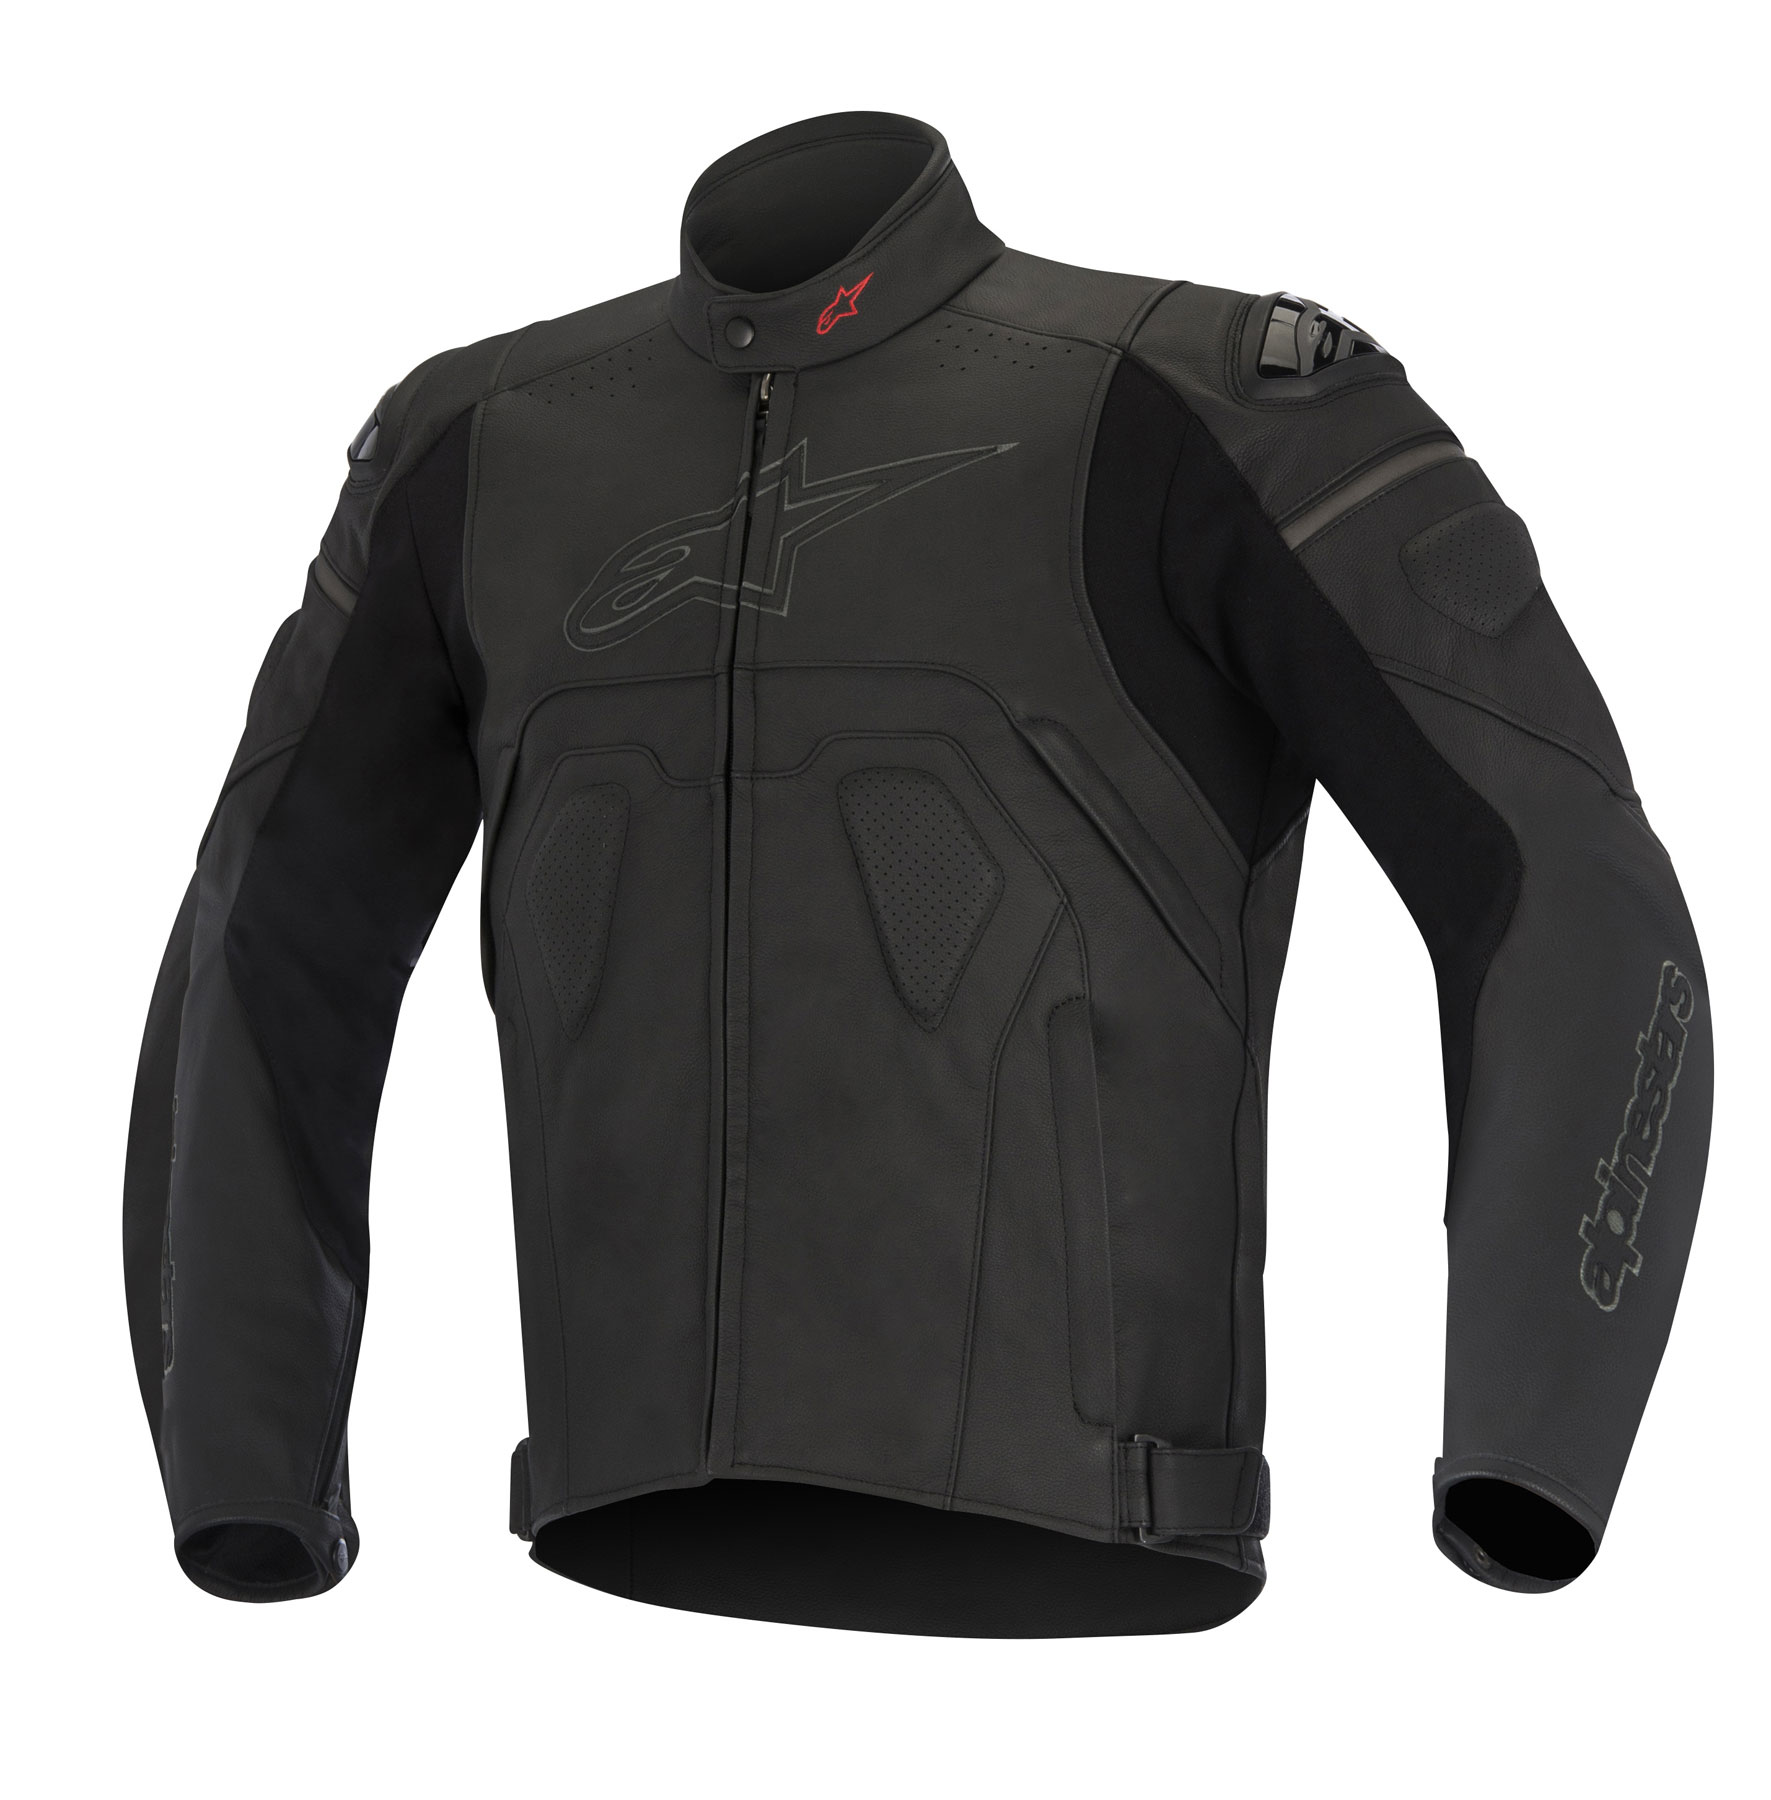 Alpinestars CORE Leather Jacket (Black)